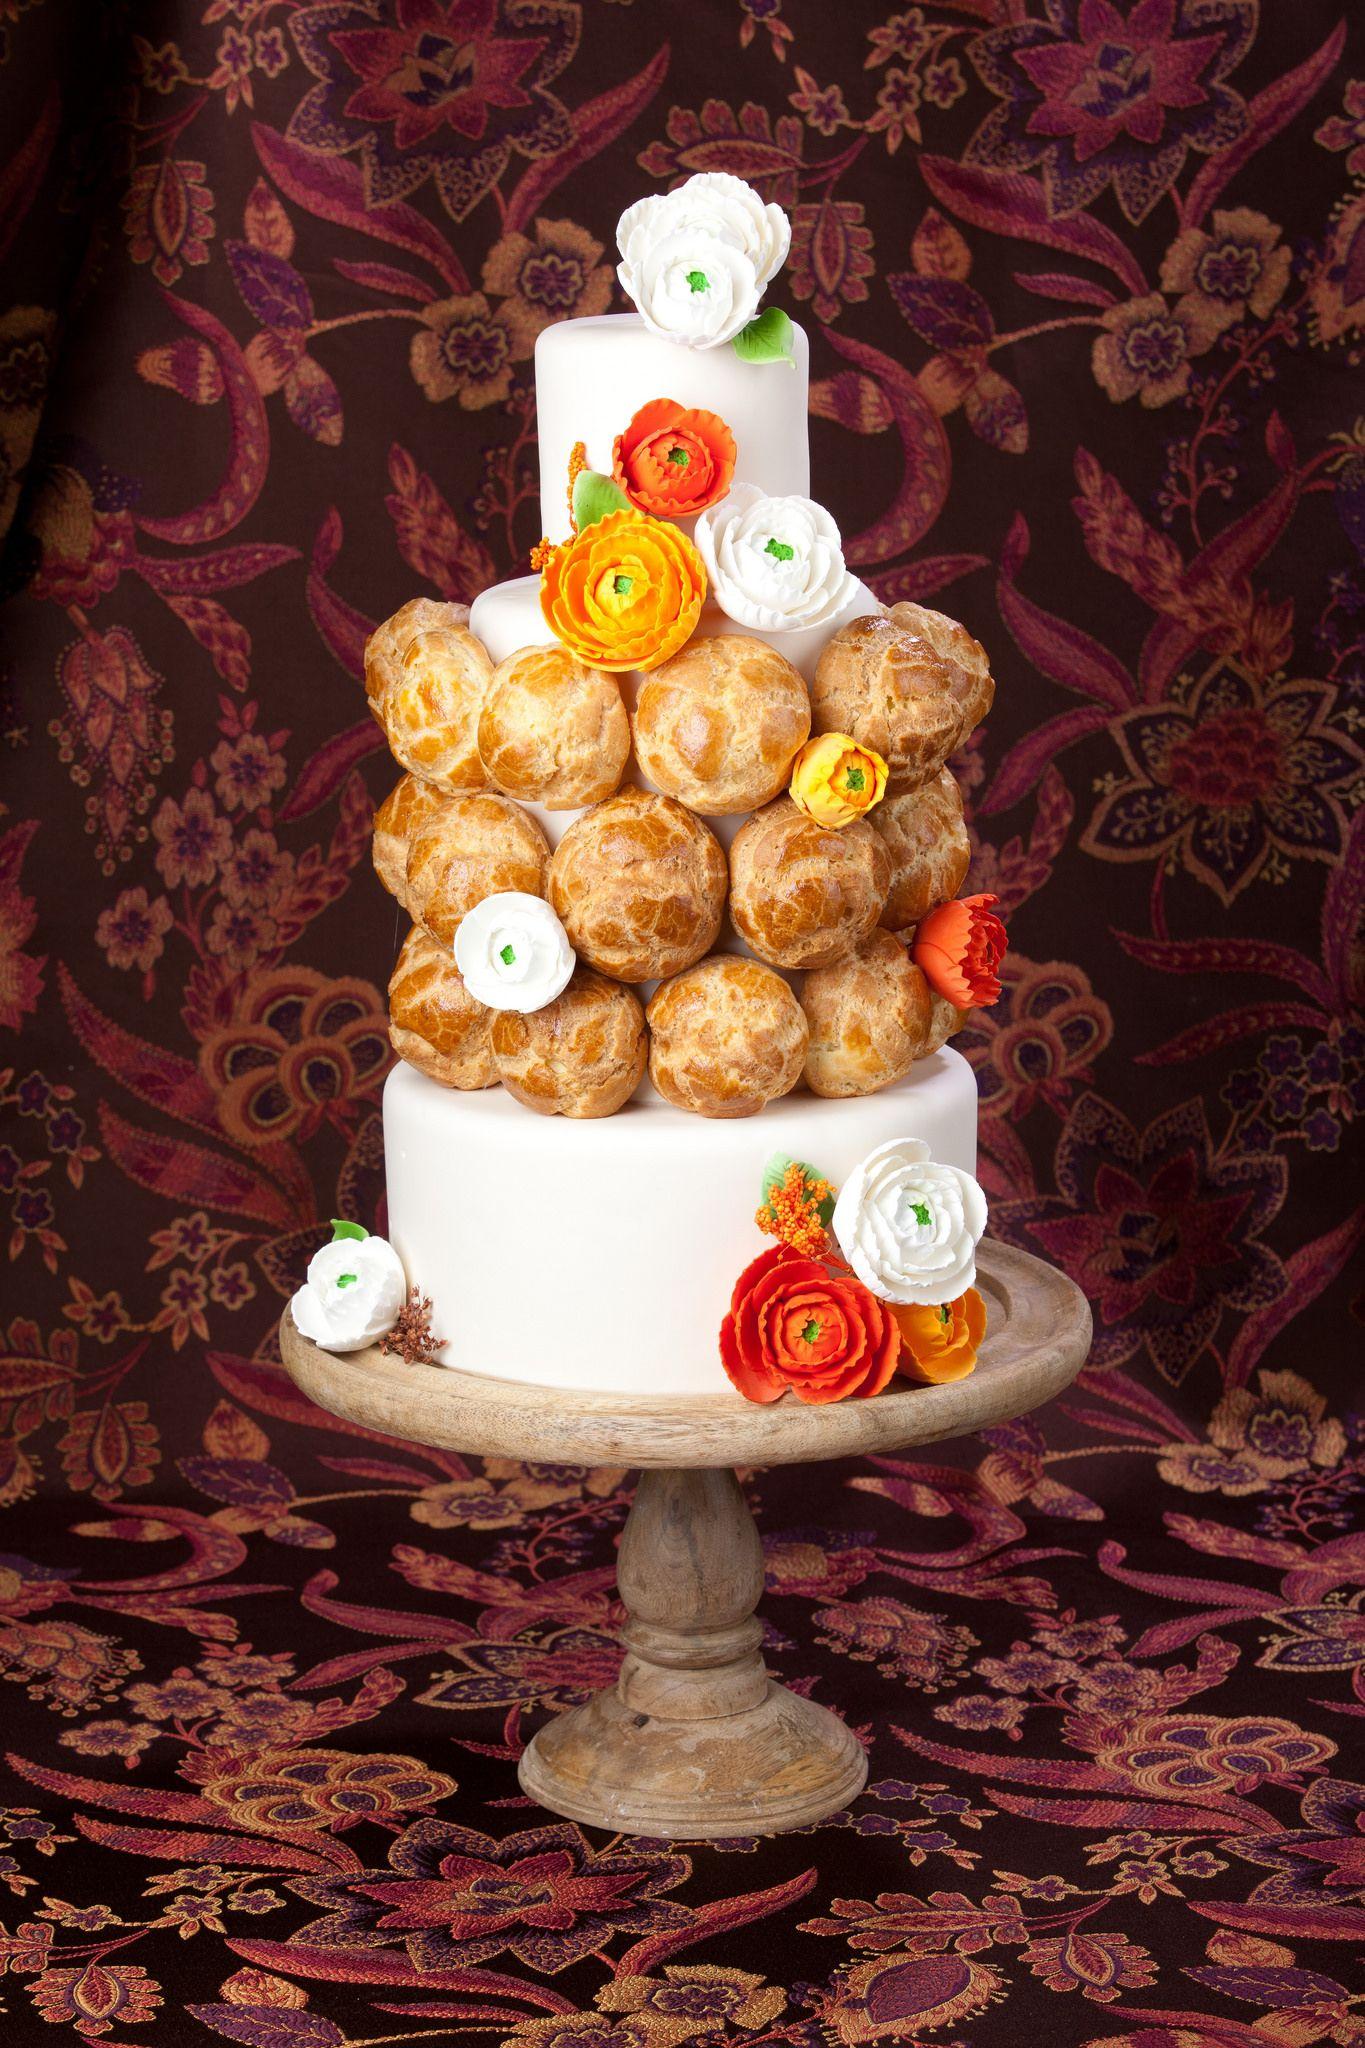 Pastry love   Wedding cake by  Bombon Cake Gallery   ©Edward Fox Photography